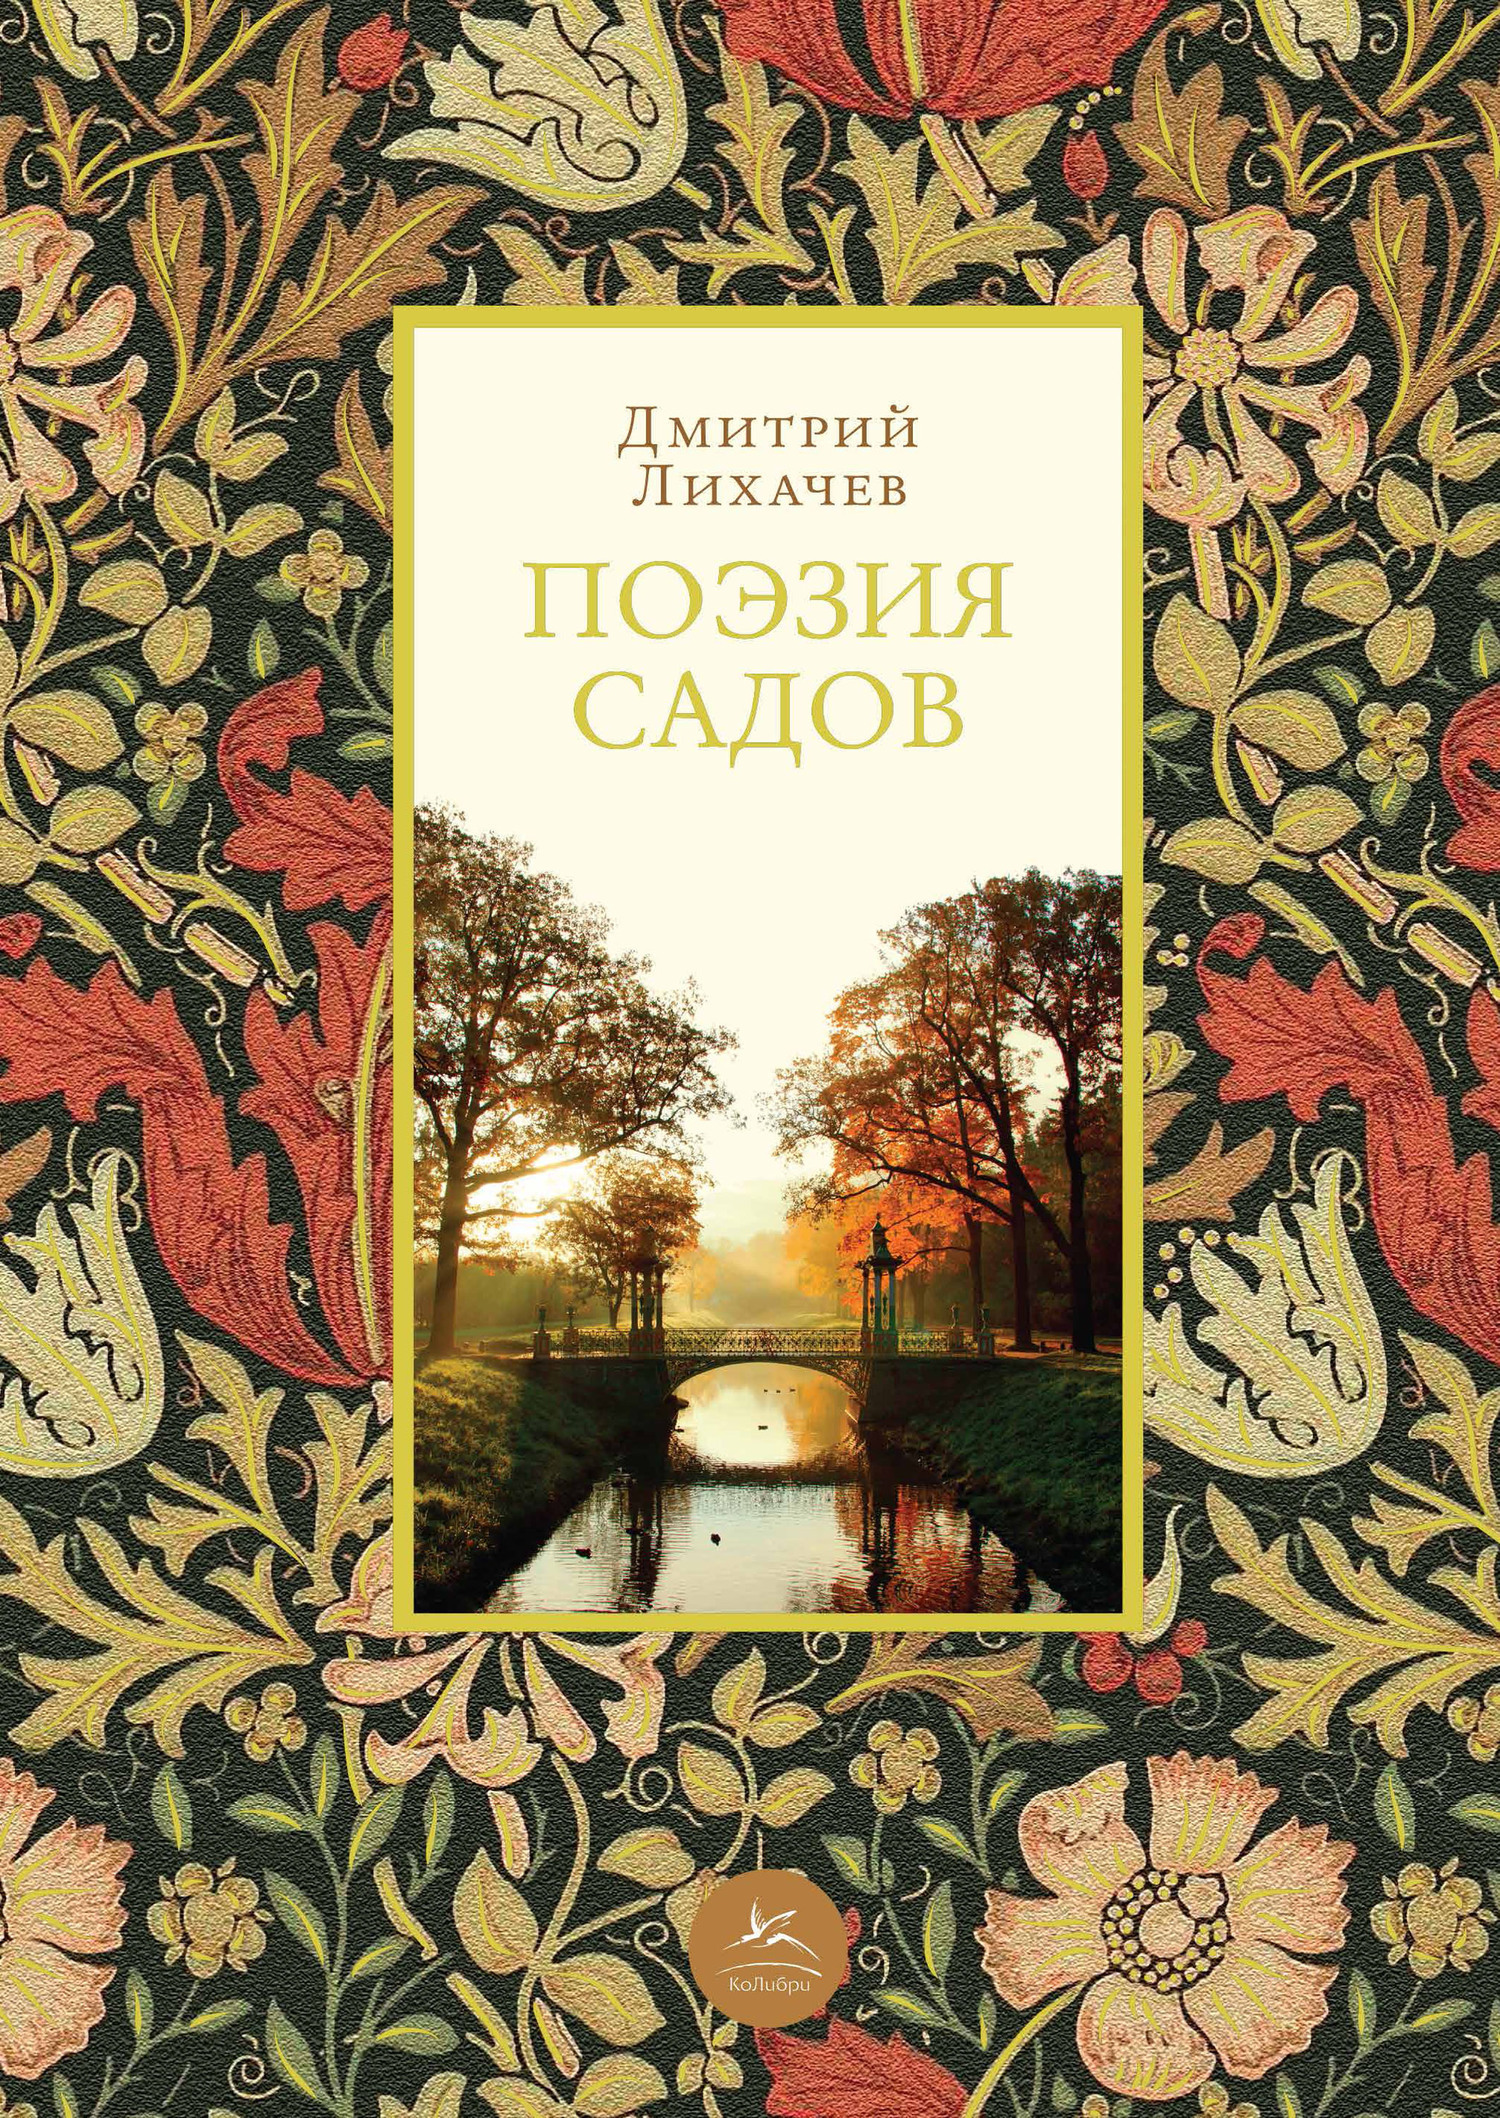 Дмитрий Лихачев Поэзия садов лихачев д поэзия садов